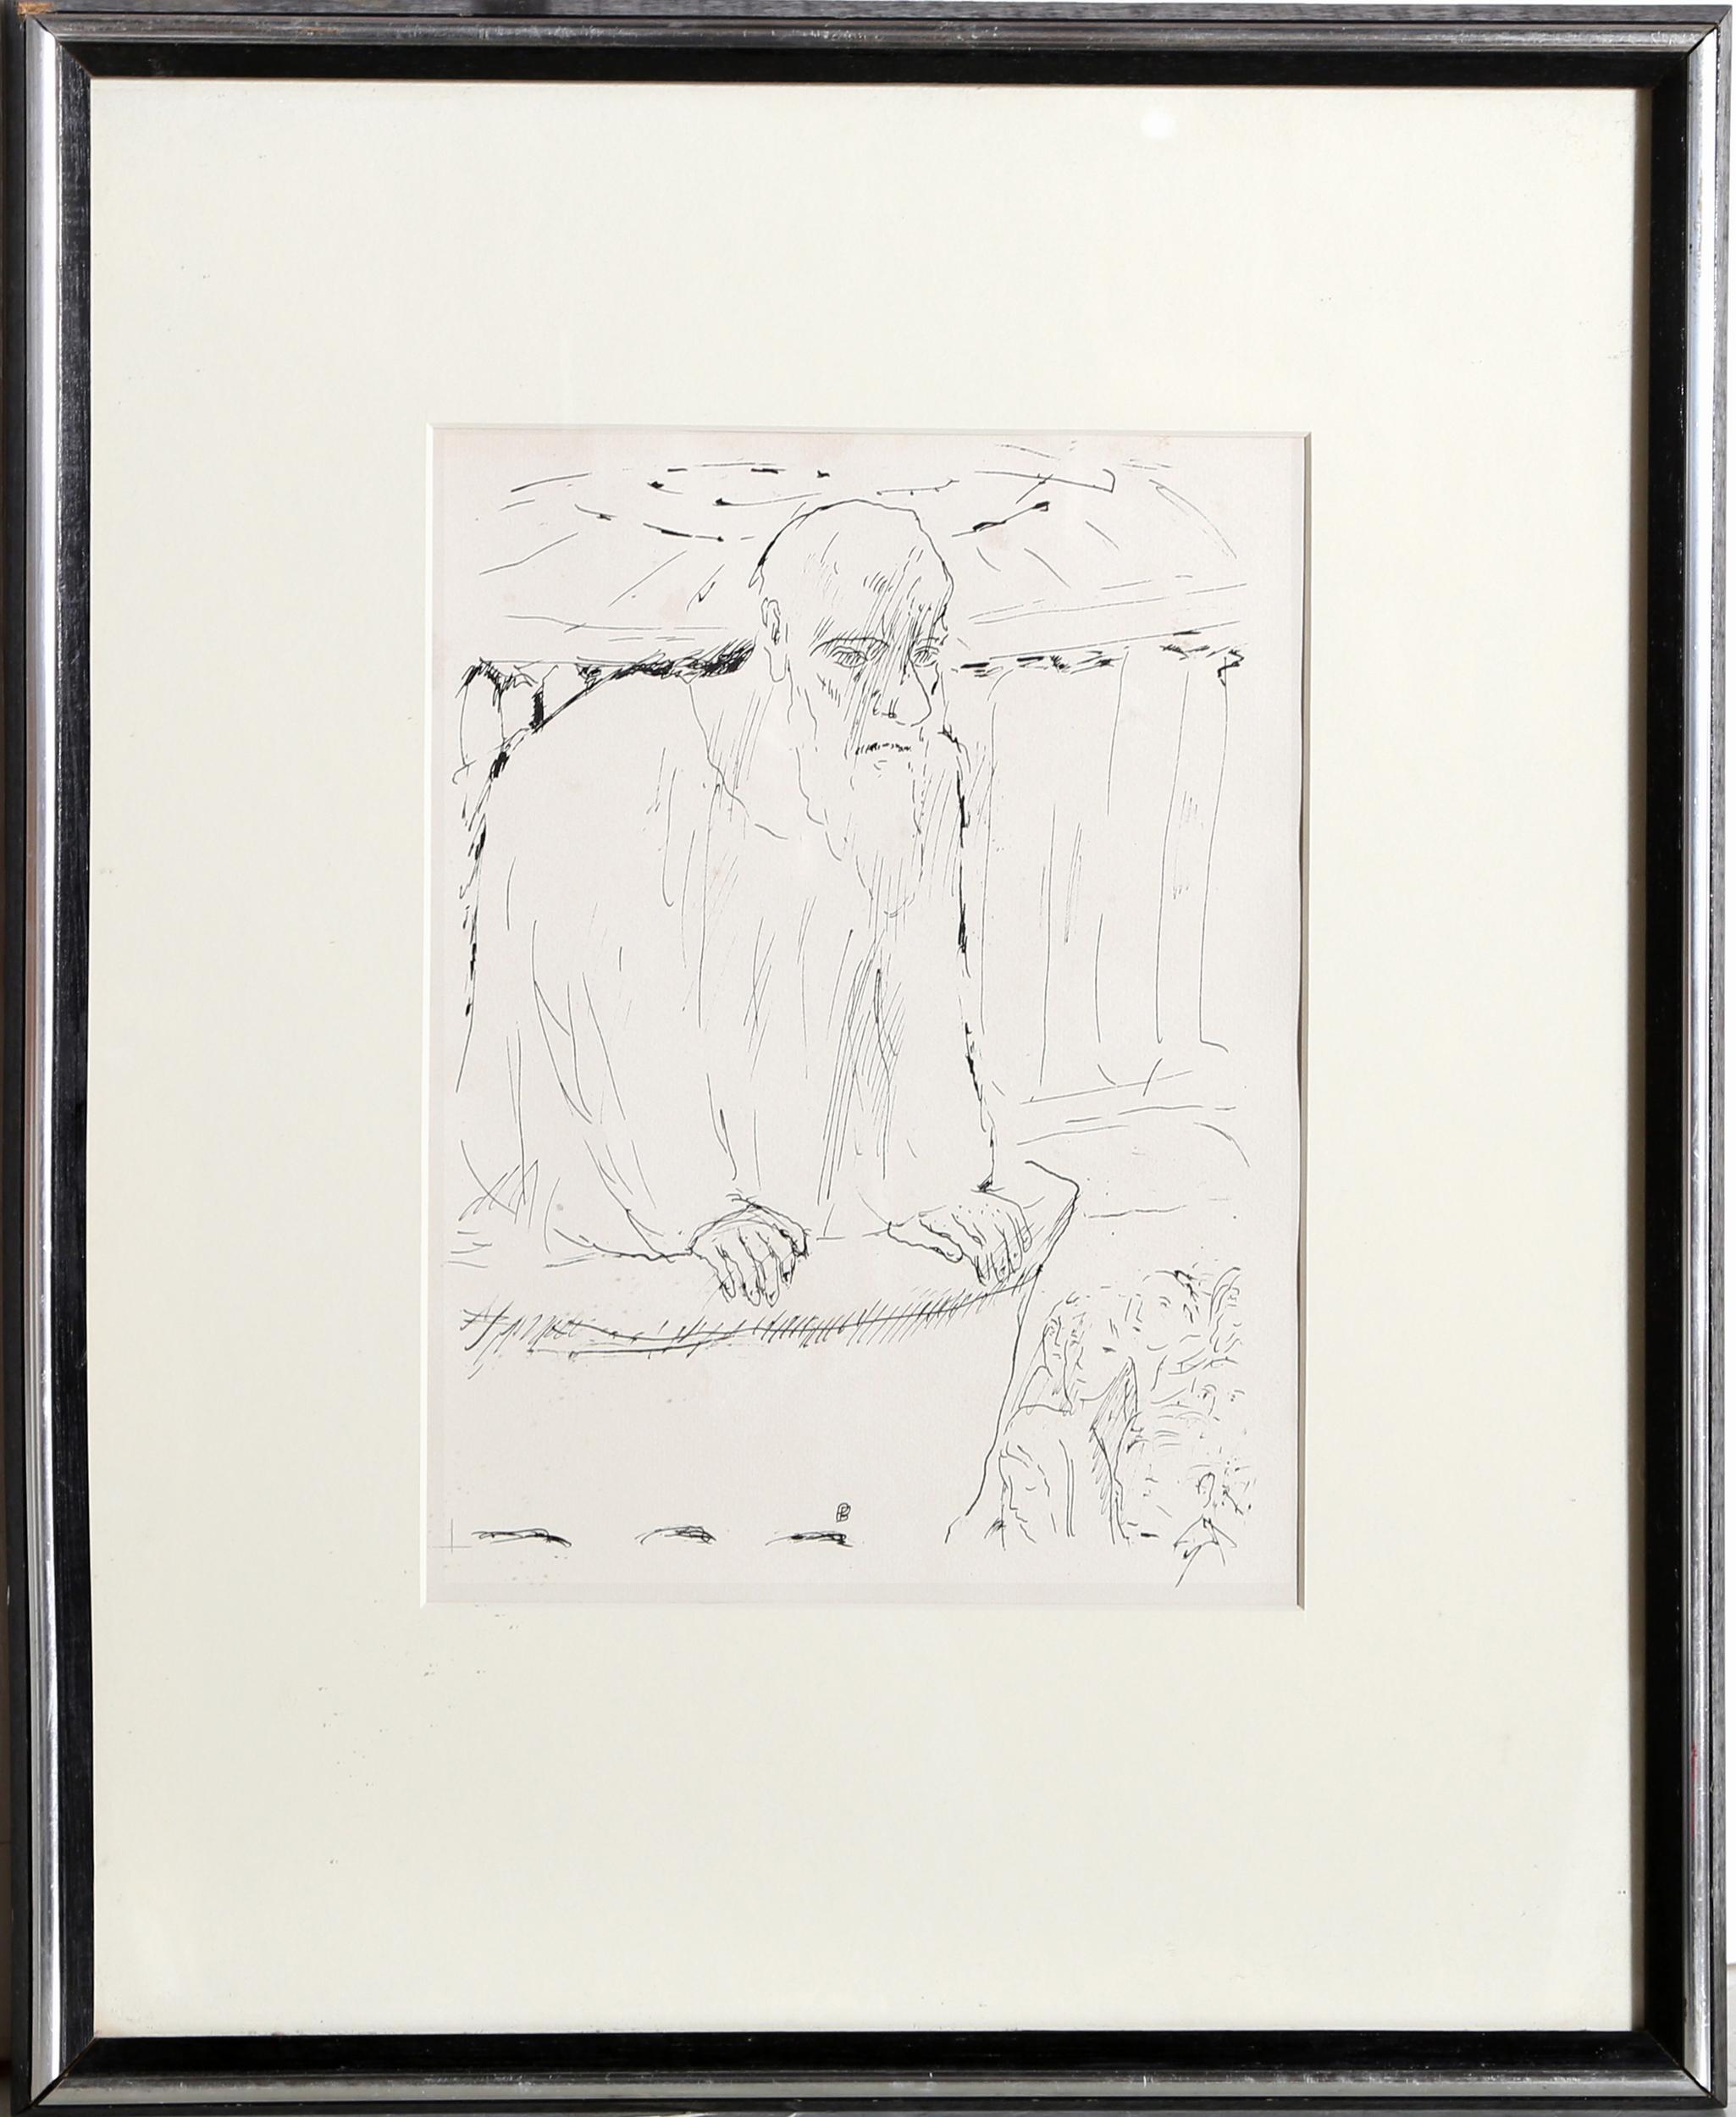 Pierre Bonnard, Old Wise Man, Lithograph